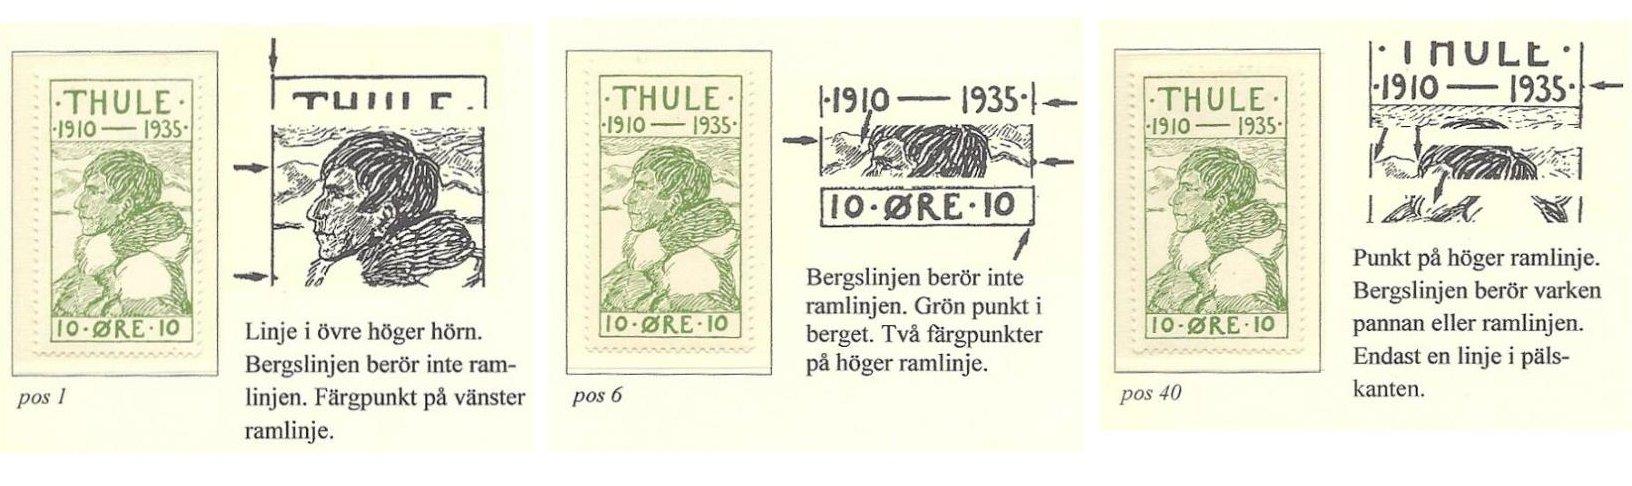 ThuleX